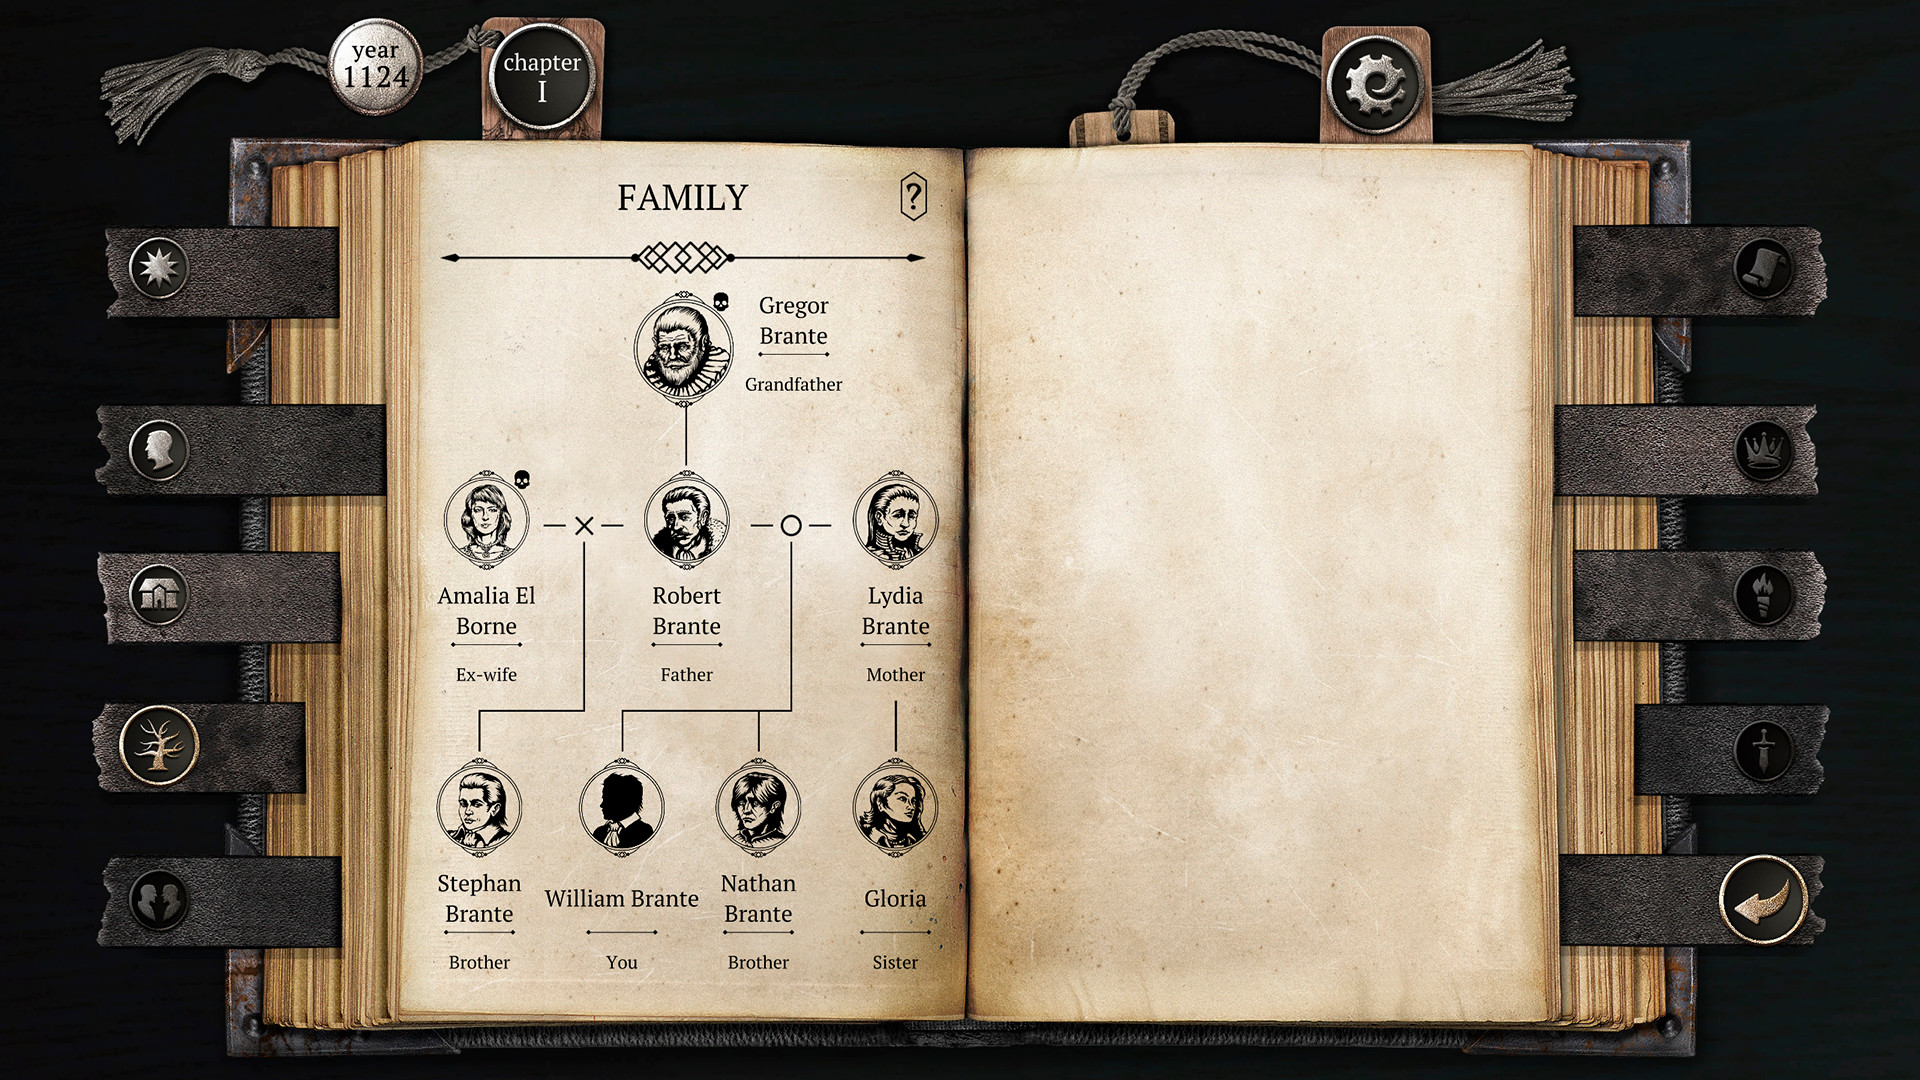 The Life and Suffering of Sir Brante — Chapter 1&2 PC Key Fiyatları